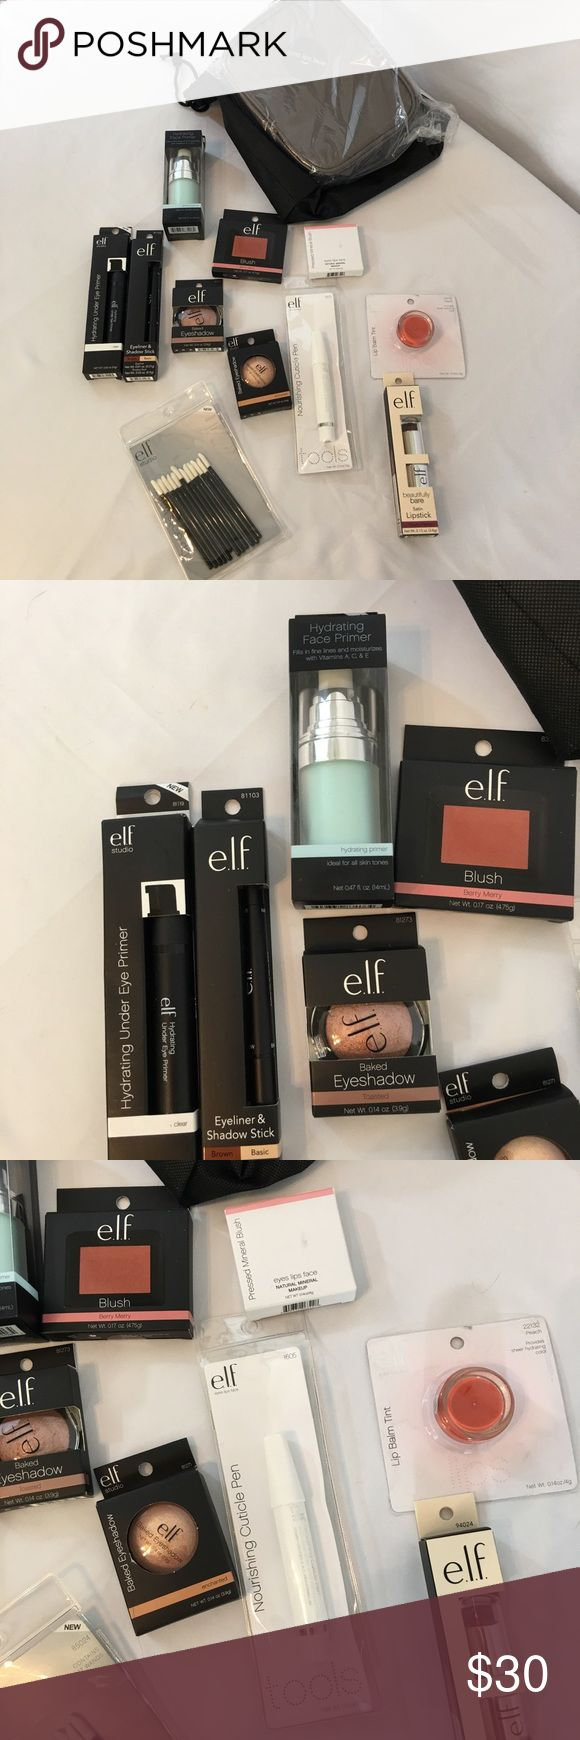 "ELF Makeup Bundle Brand new/never opened ELF makeup bundle. Includes all shown: makeup bag: 8"" x 6"" x 2"", drawstring black bag, hydrating face primer, undereye primer, 2 baked eyeshadows, 2 blushes, disposable lip gloss wands, moisturizing cuticle pen, lip gloss, lip stick & eye liner/shadow stick. All NWT!! No trades ELF Makeup"